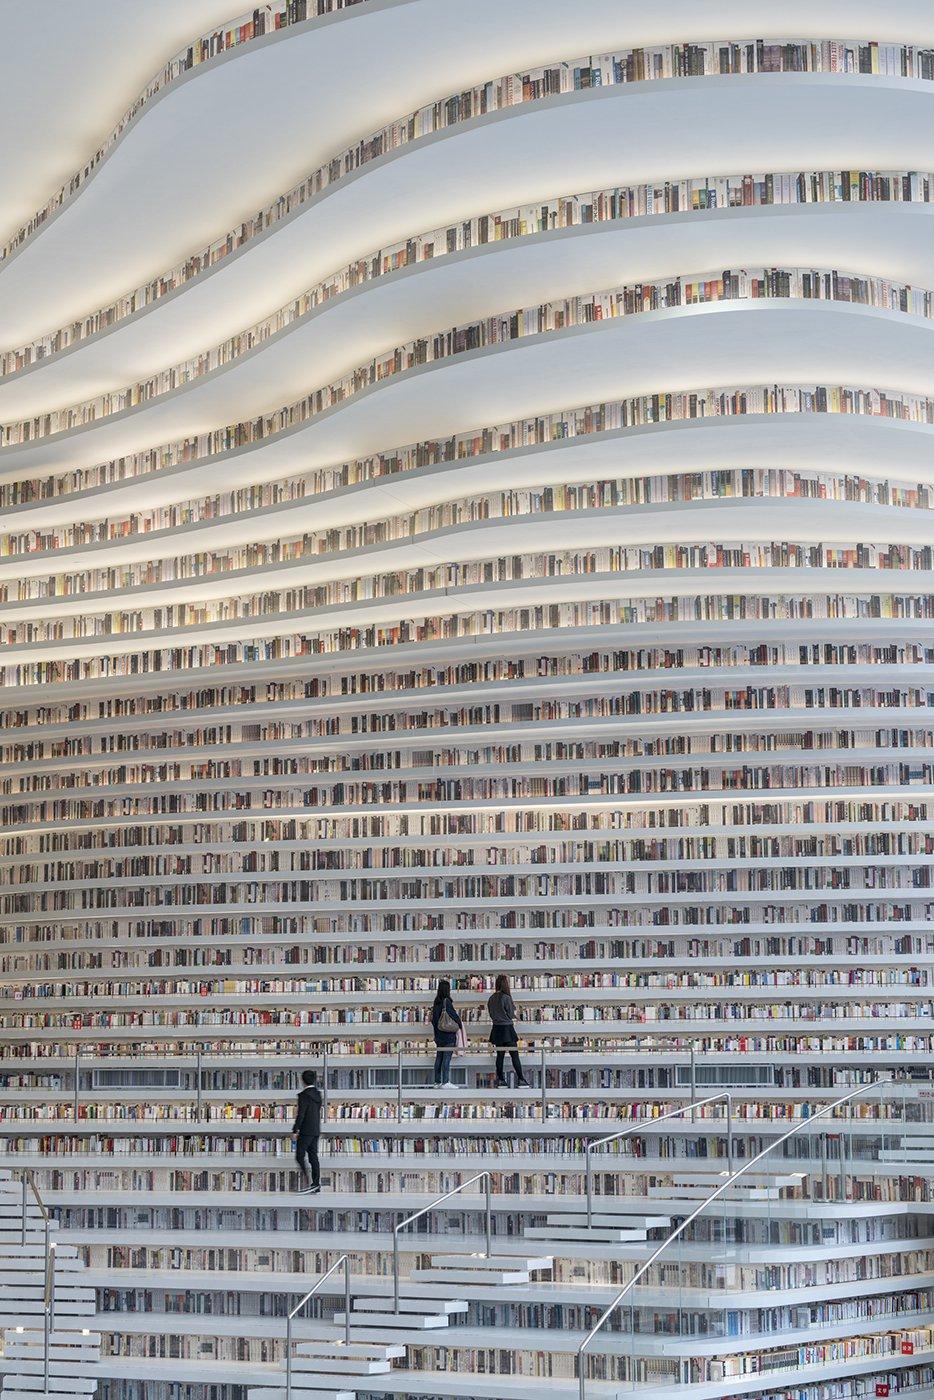 09c_Tianjin_Library_∏Ossip.jpg